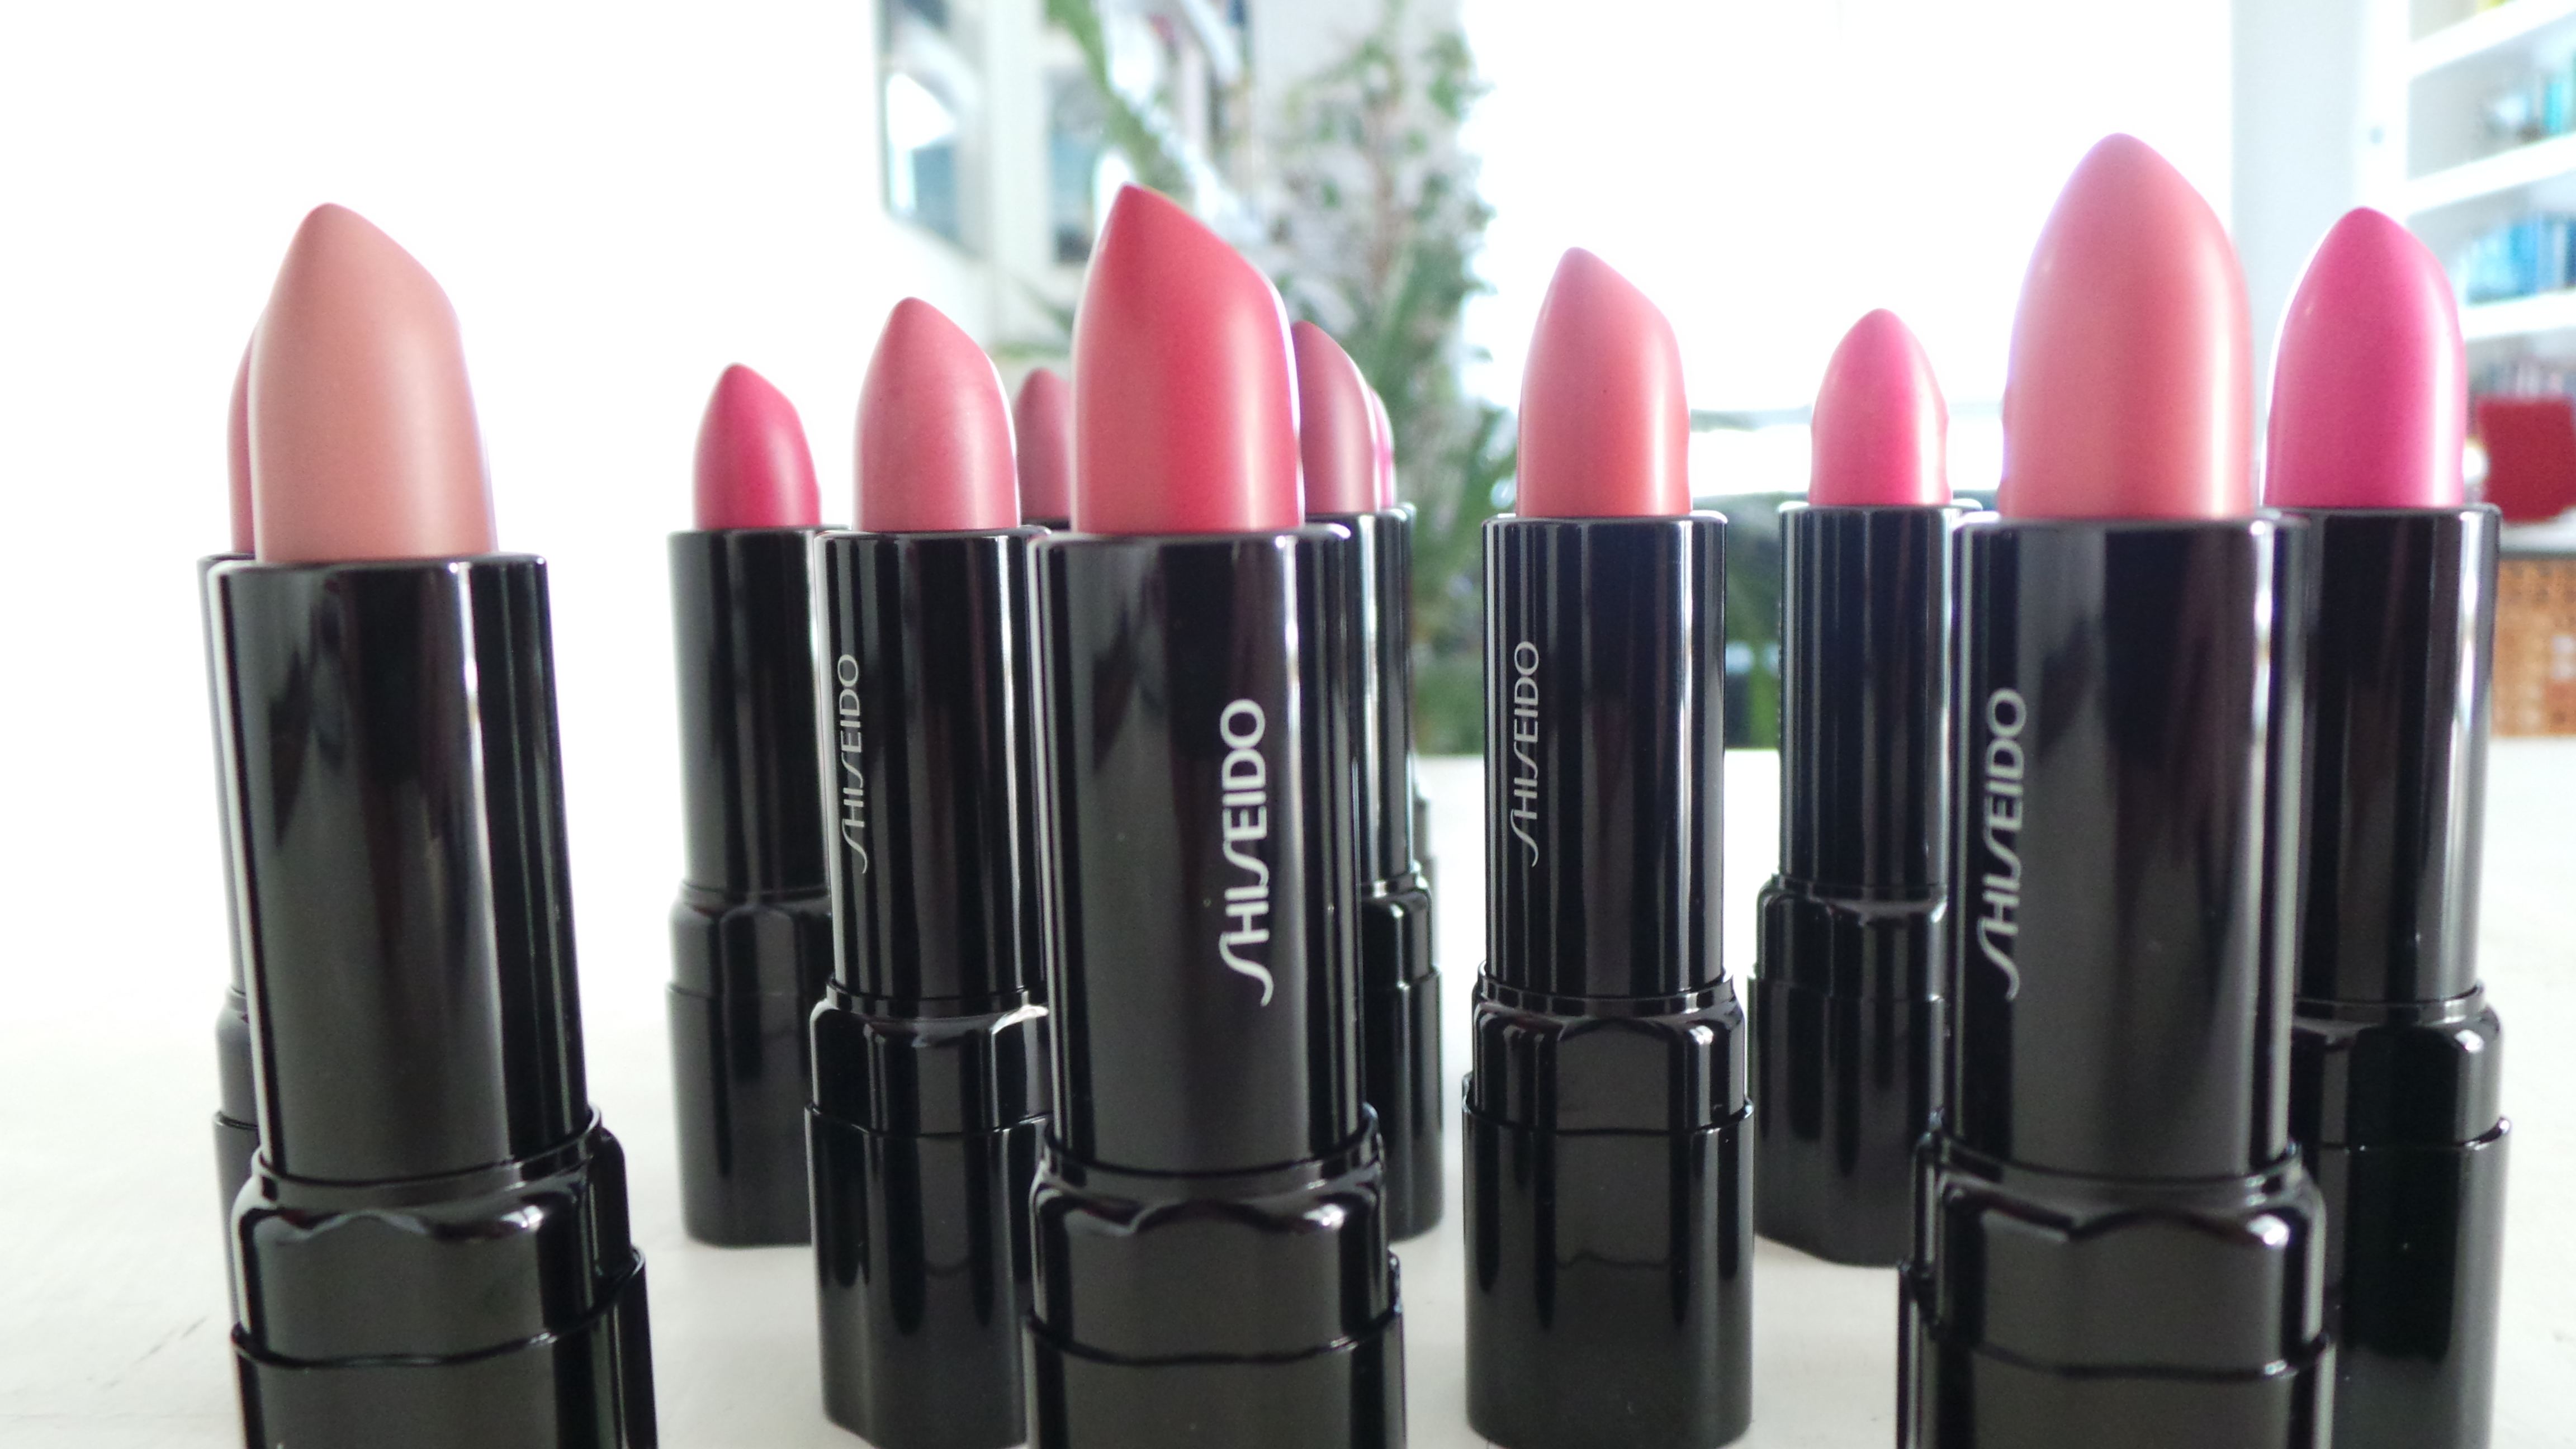 rossetti Shiseido makeup